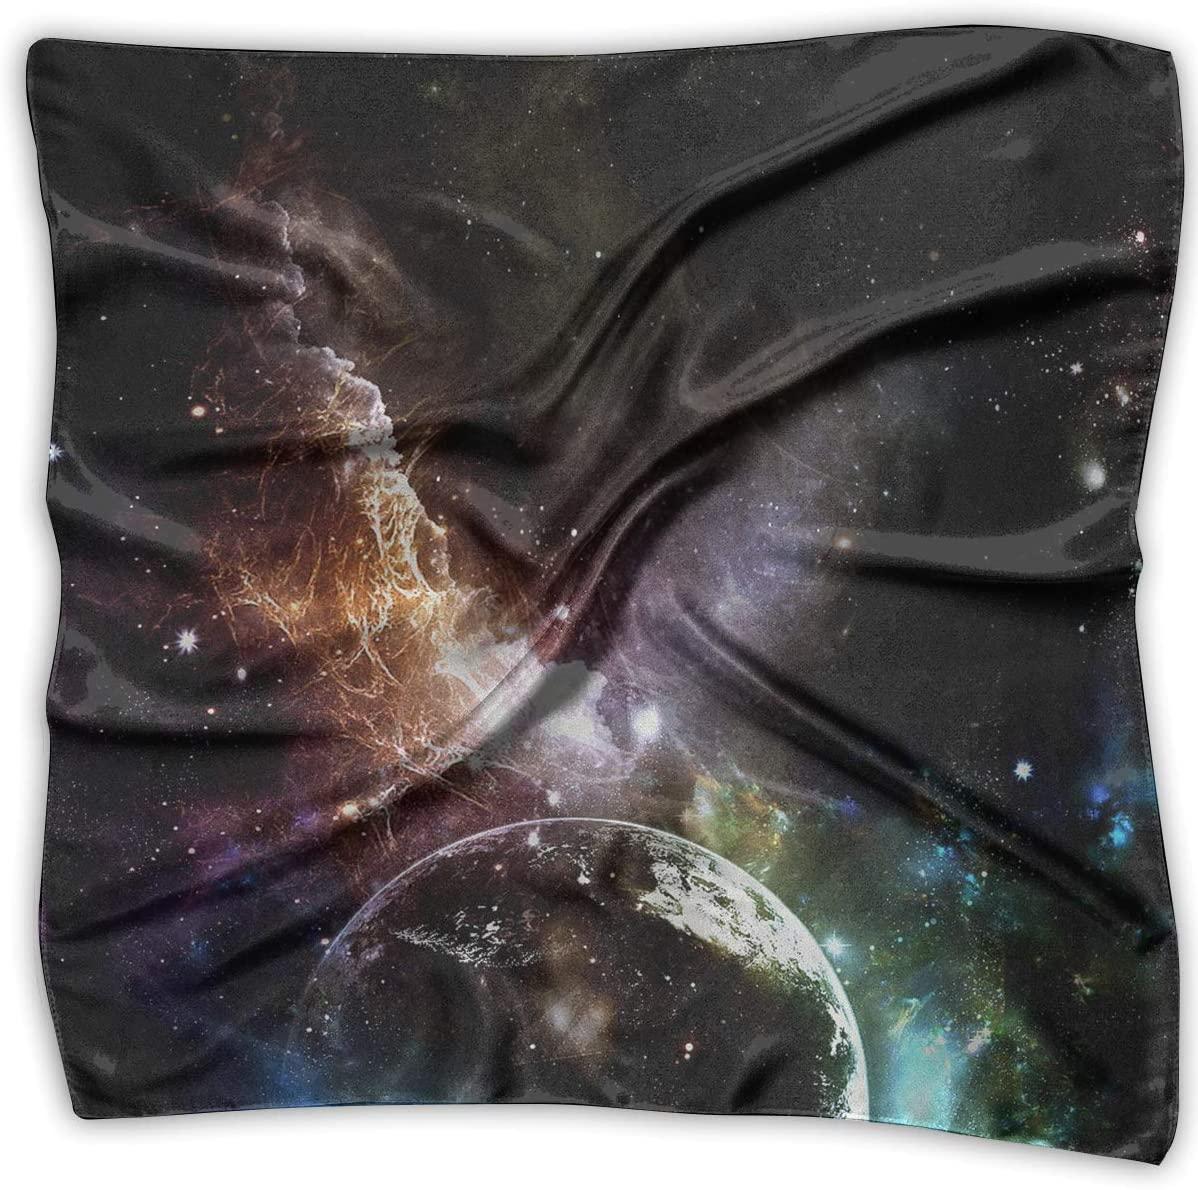 WFIRE Outer Space Nebula Square Handkerchiefs Scarf Shawl Bandanas Headscarf Neckerchief Tie Hair Scarf